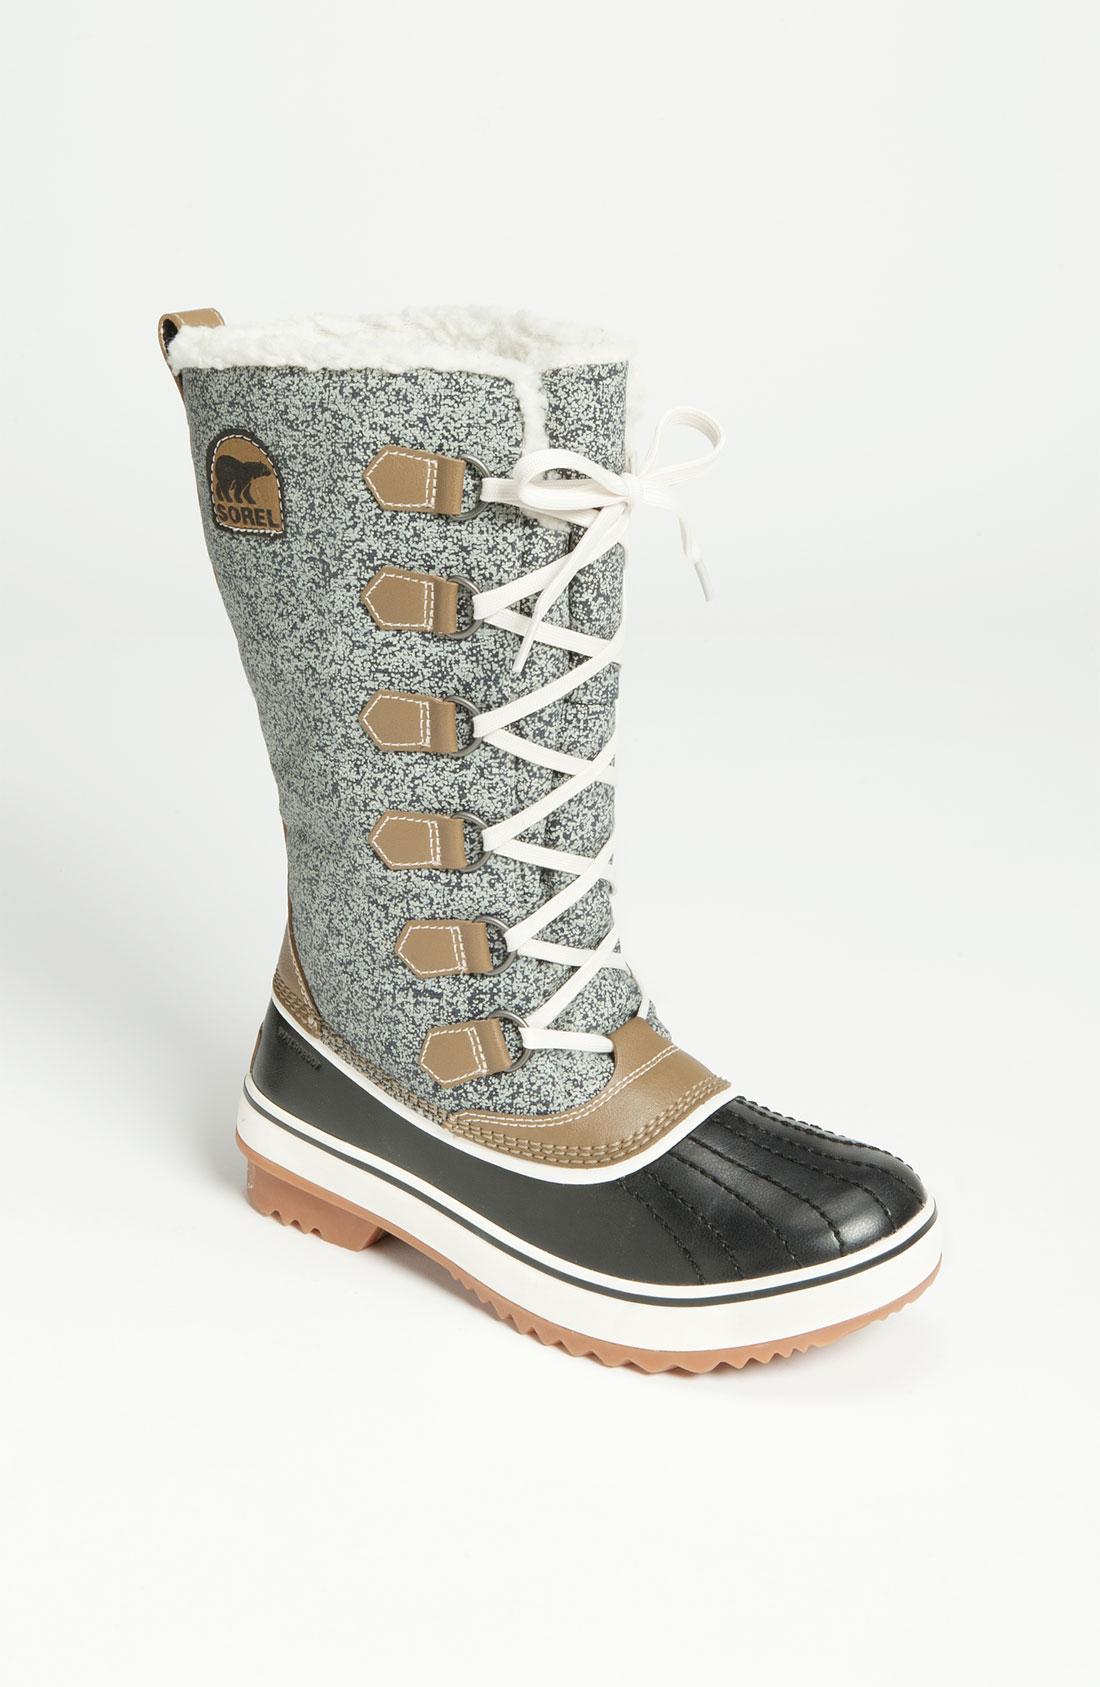 sorel tivoli high waterproof boot in gray black grey lyst